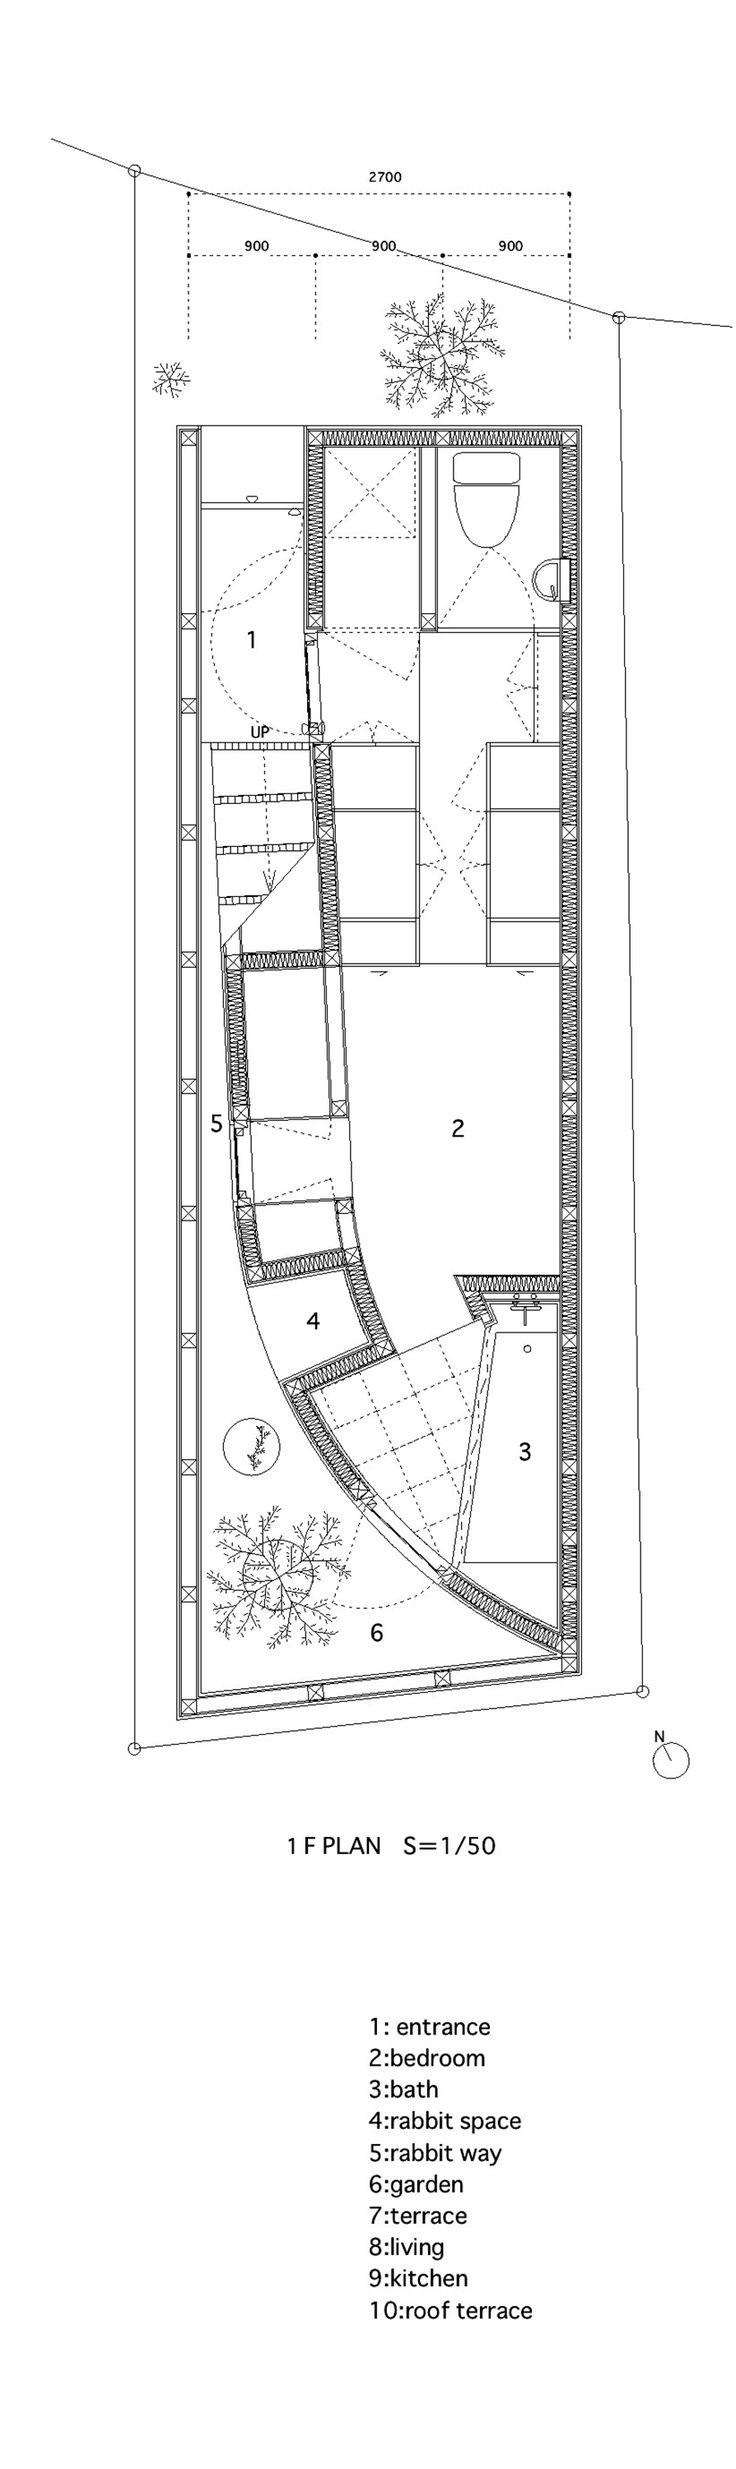 34 best floor plans images on pinterest floor plans architects